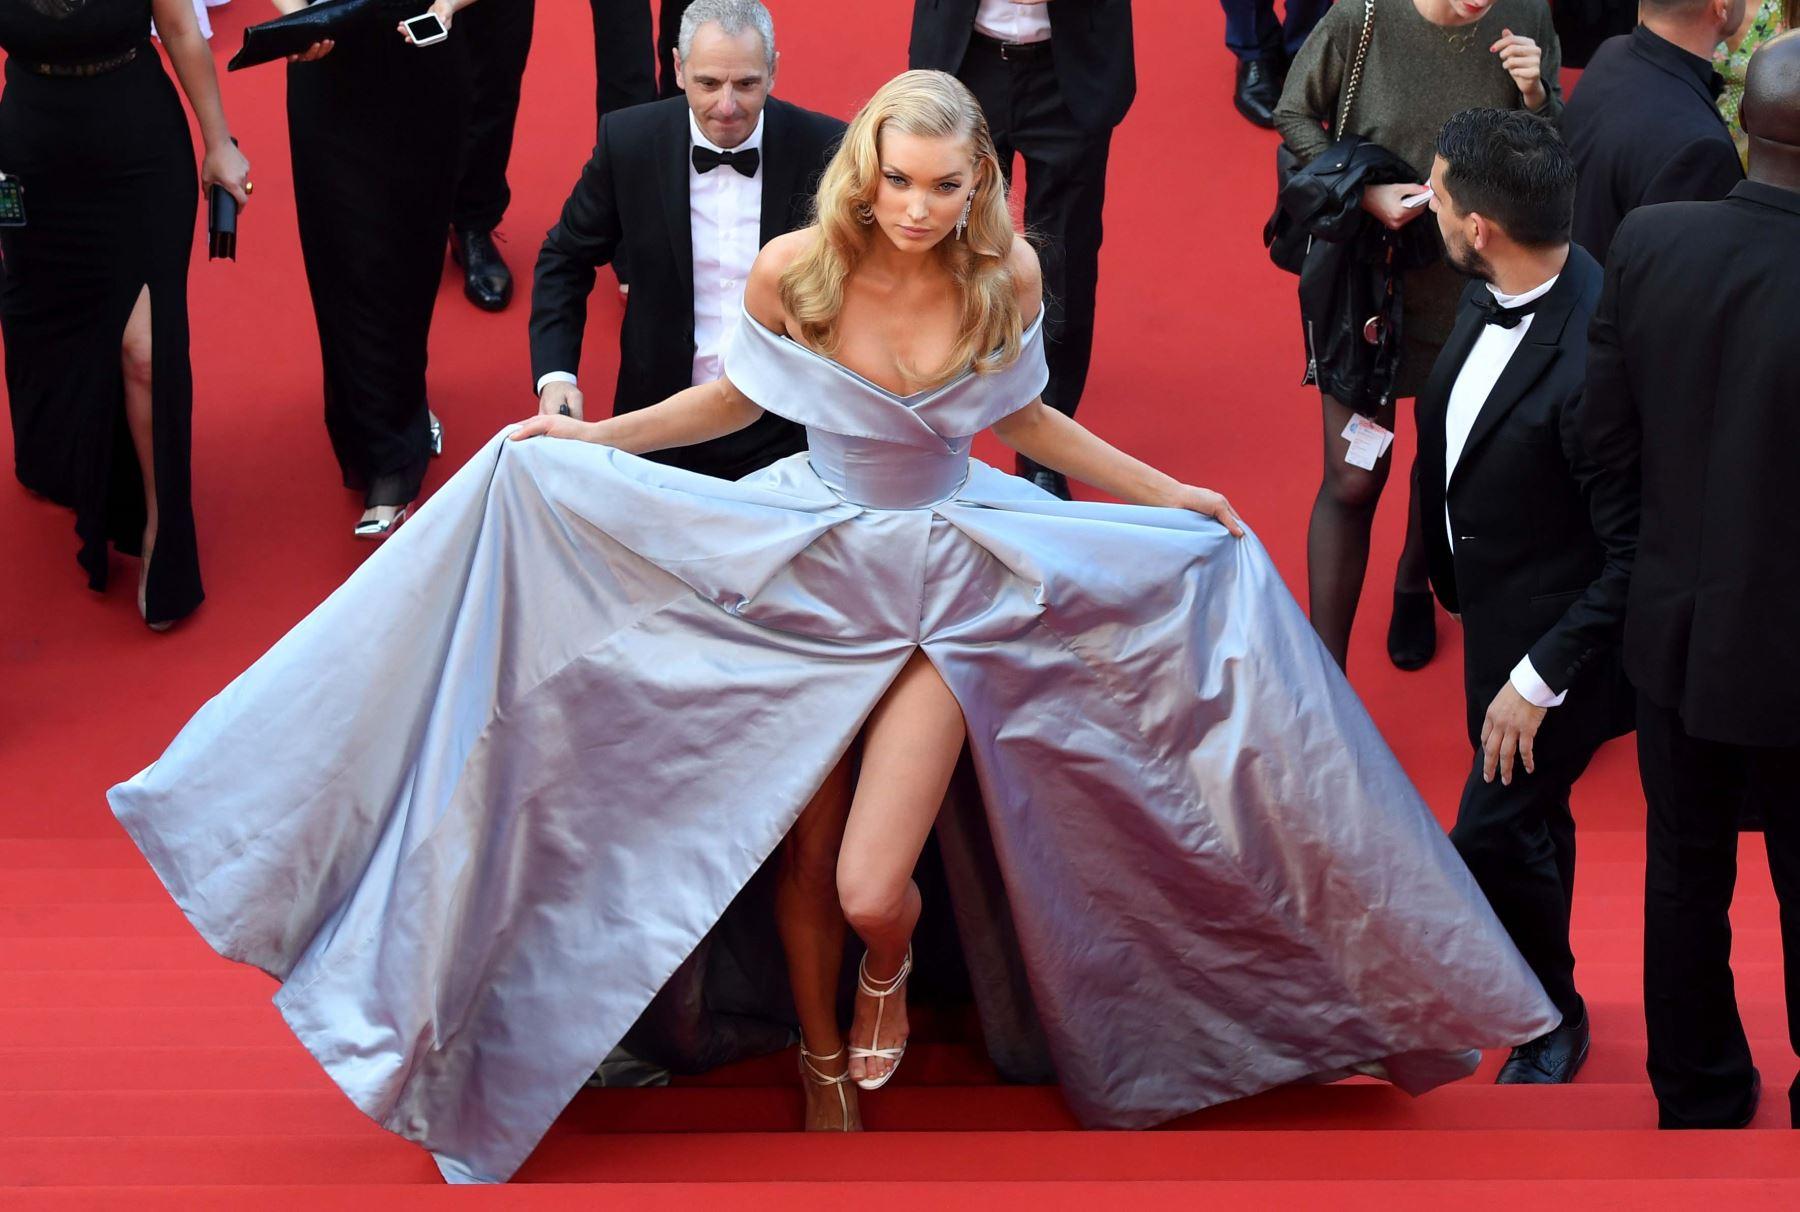 La modelo sueca Elsa Hosk llega al Festival de Cine de Cannes. Foto: AFP